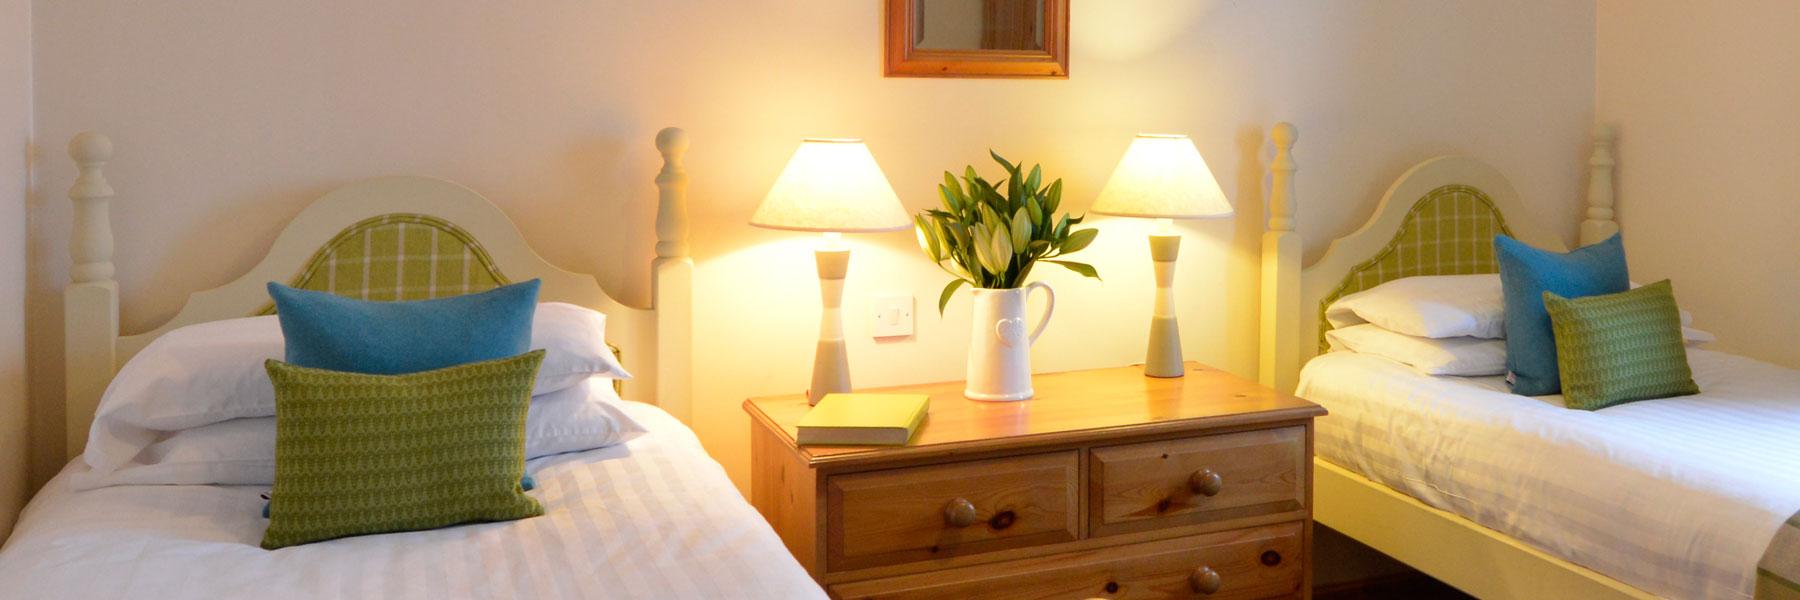 Drumcroy twin bedroom